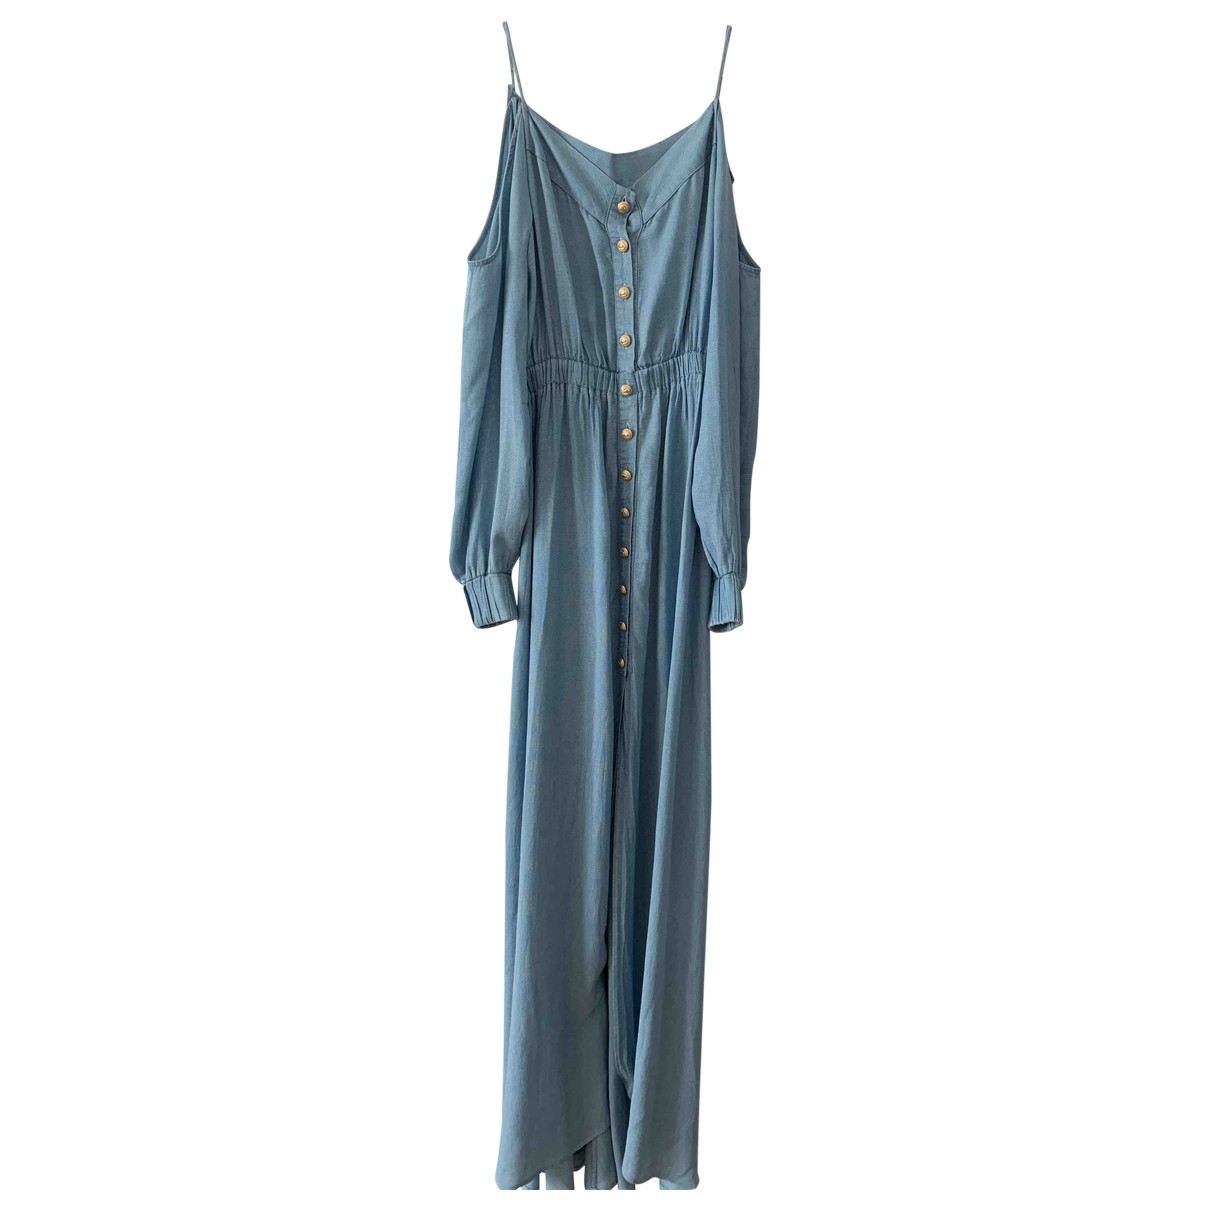 Balmain \N Turquoise Cotton dress for Women 34 FR